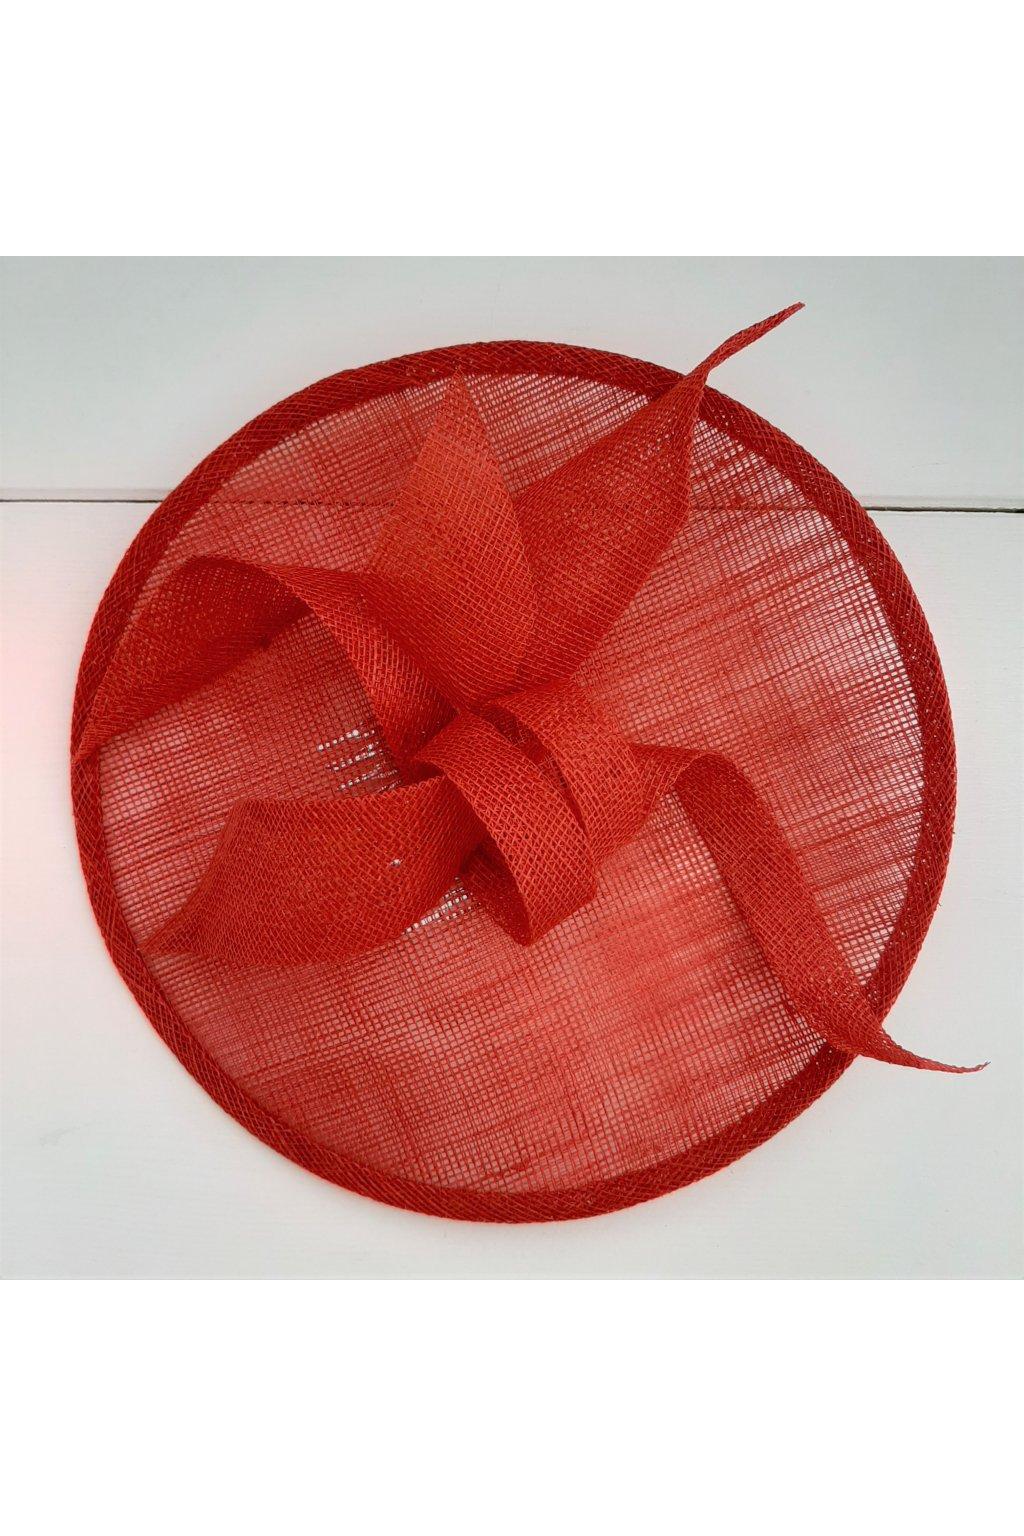 červený fascinátor ALATE